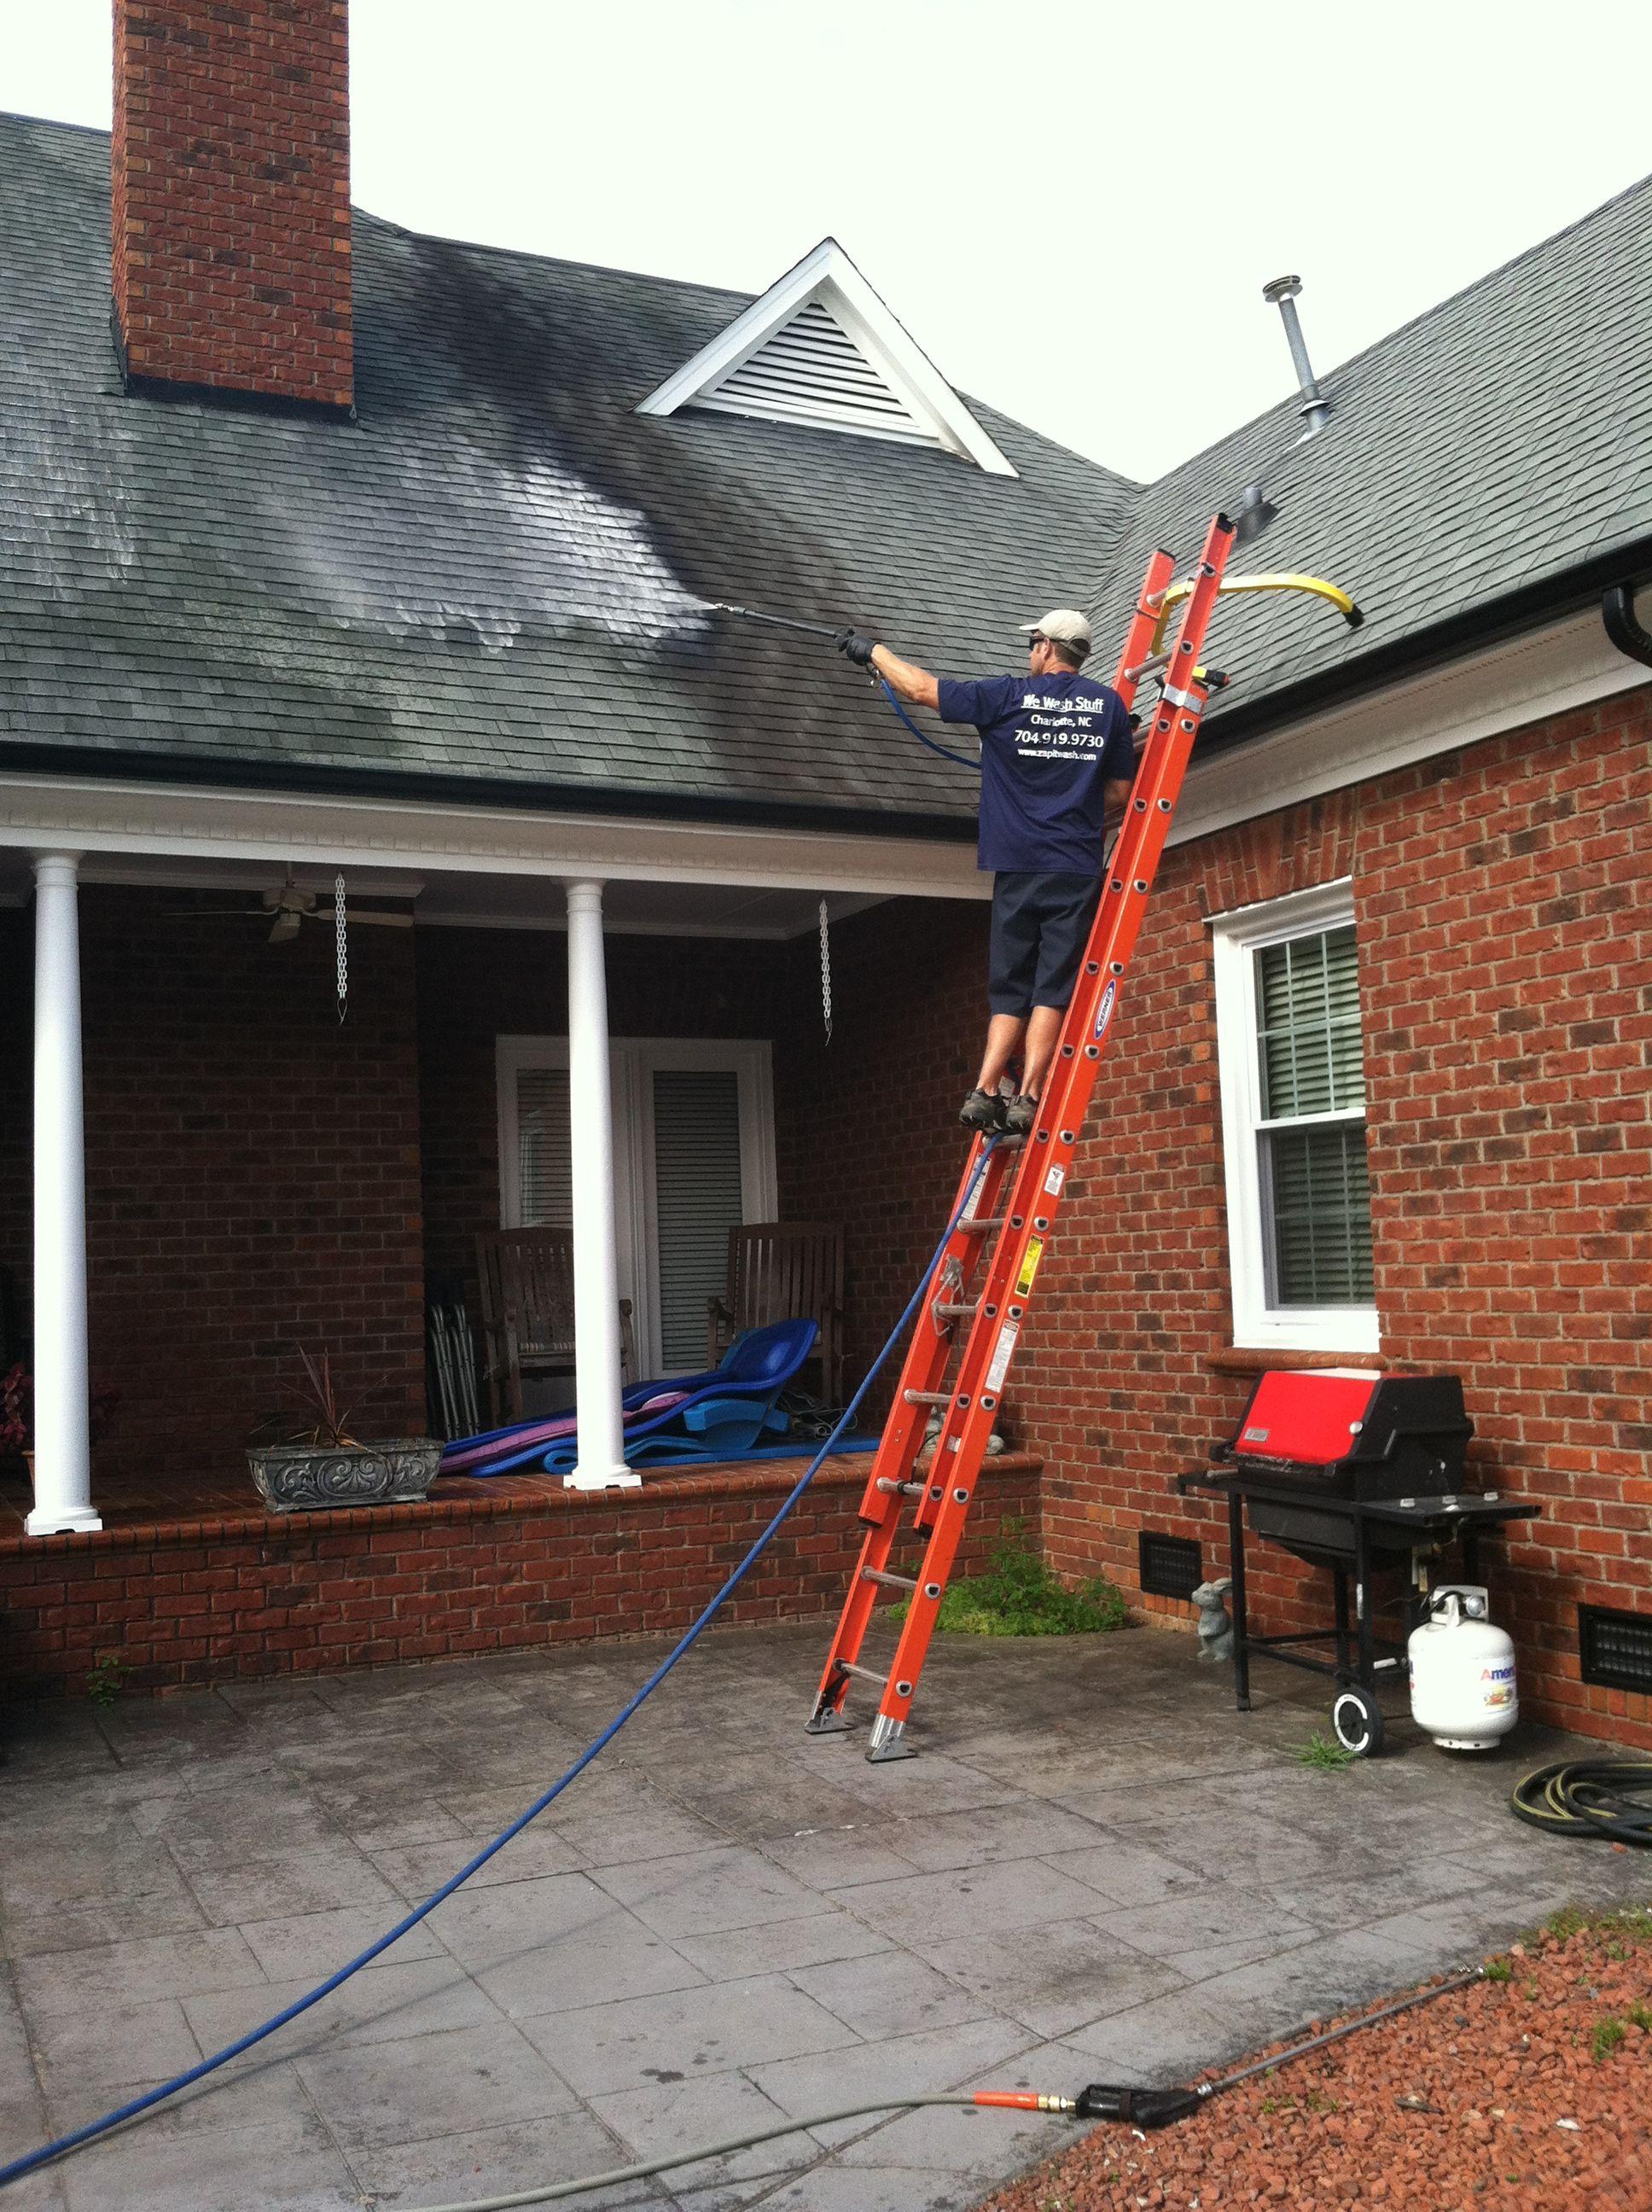 Pressure Washing Roof In Monroe Nc Roof Cleaning Pressure Washing Business Pressure Washing